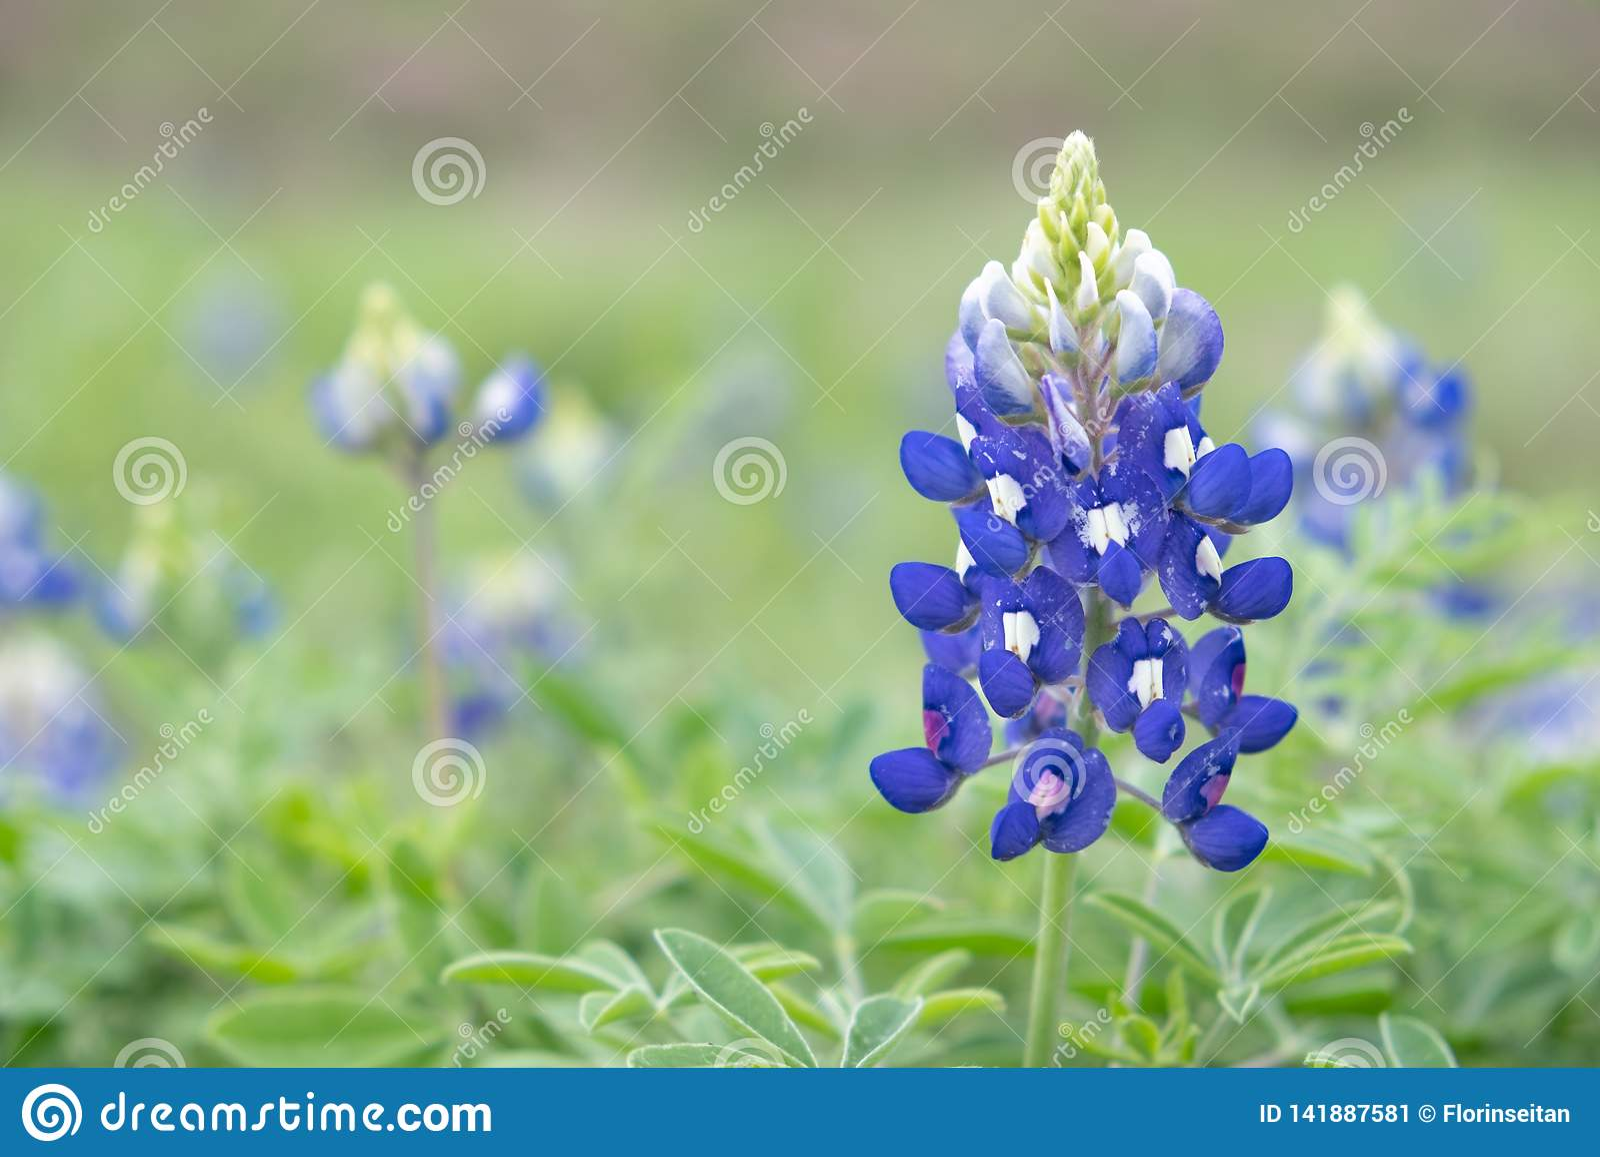 Blue bonnets field, close up